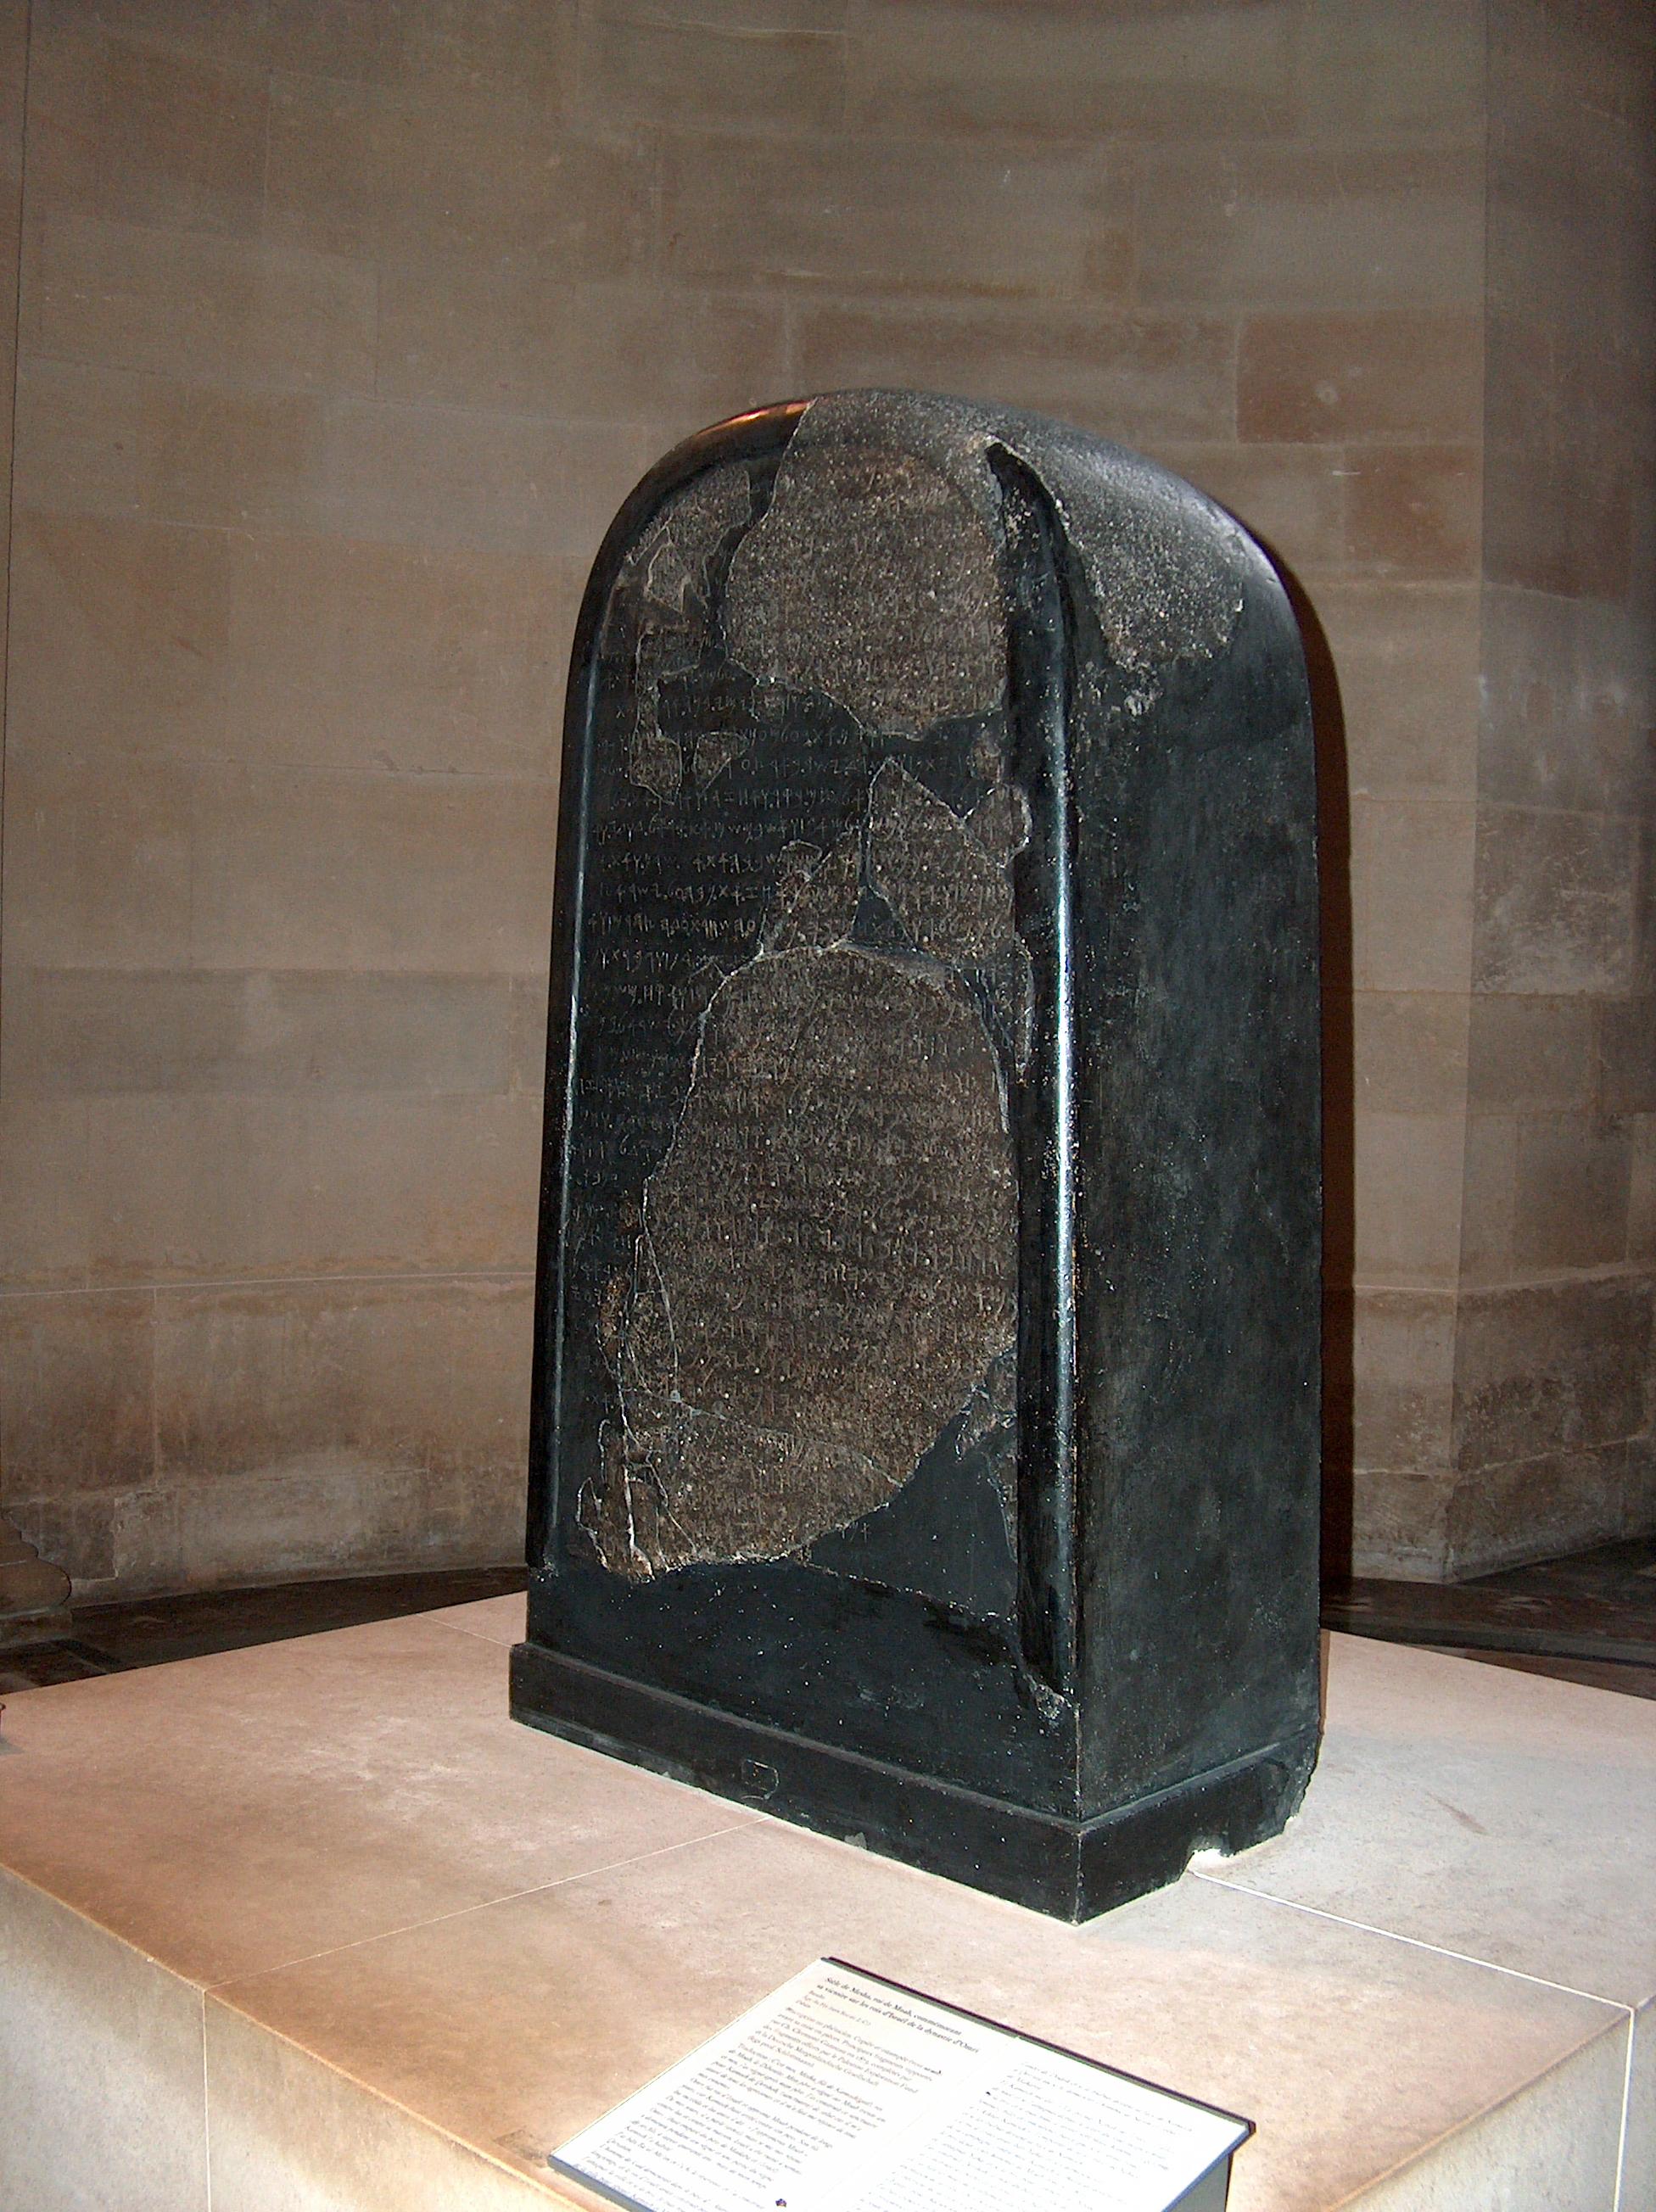 The Moab Stone